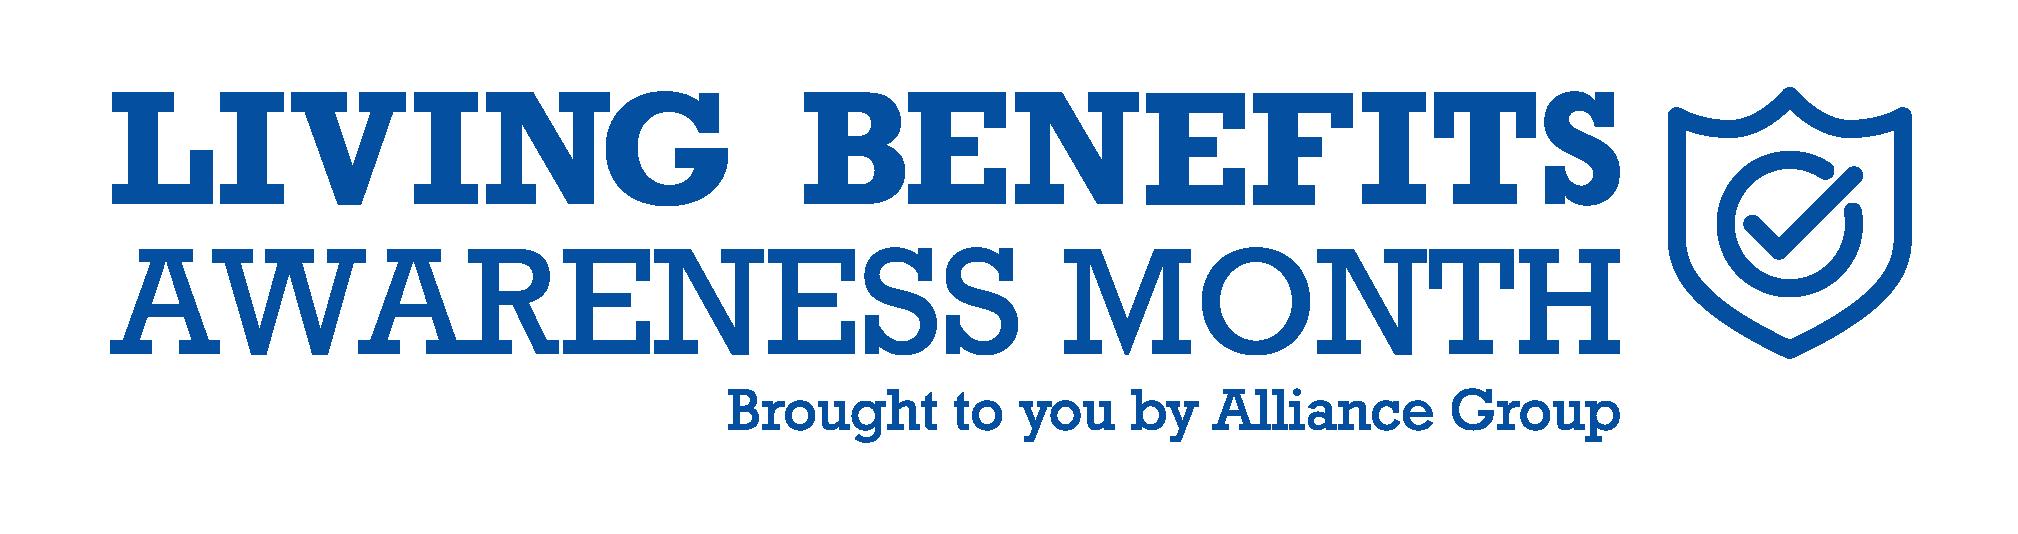 life insurance living benefits   living benefits awareness month   living benefits of life insurance